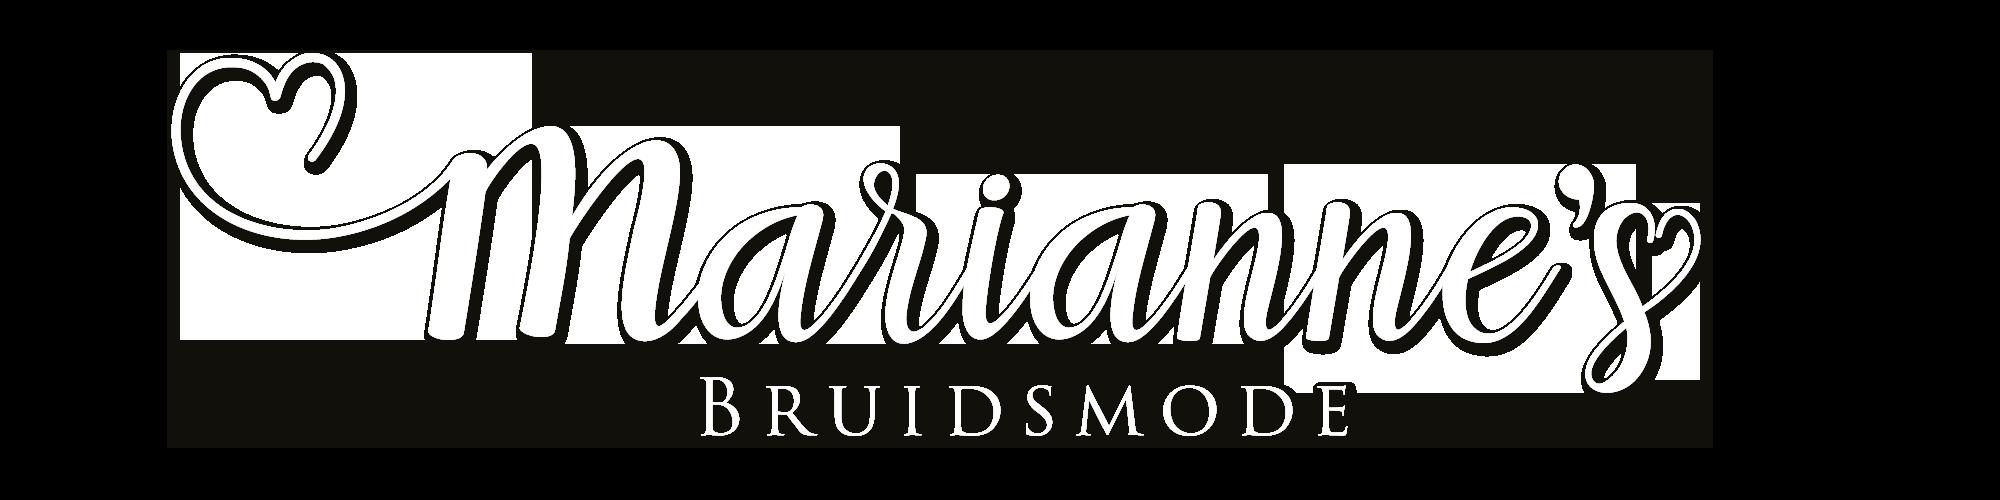 Marianne's bruidsmode